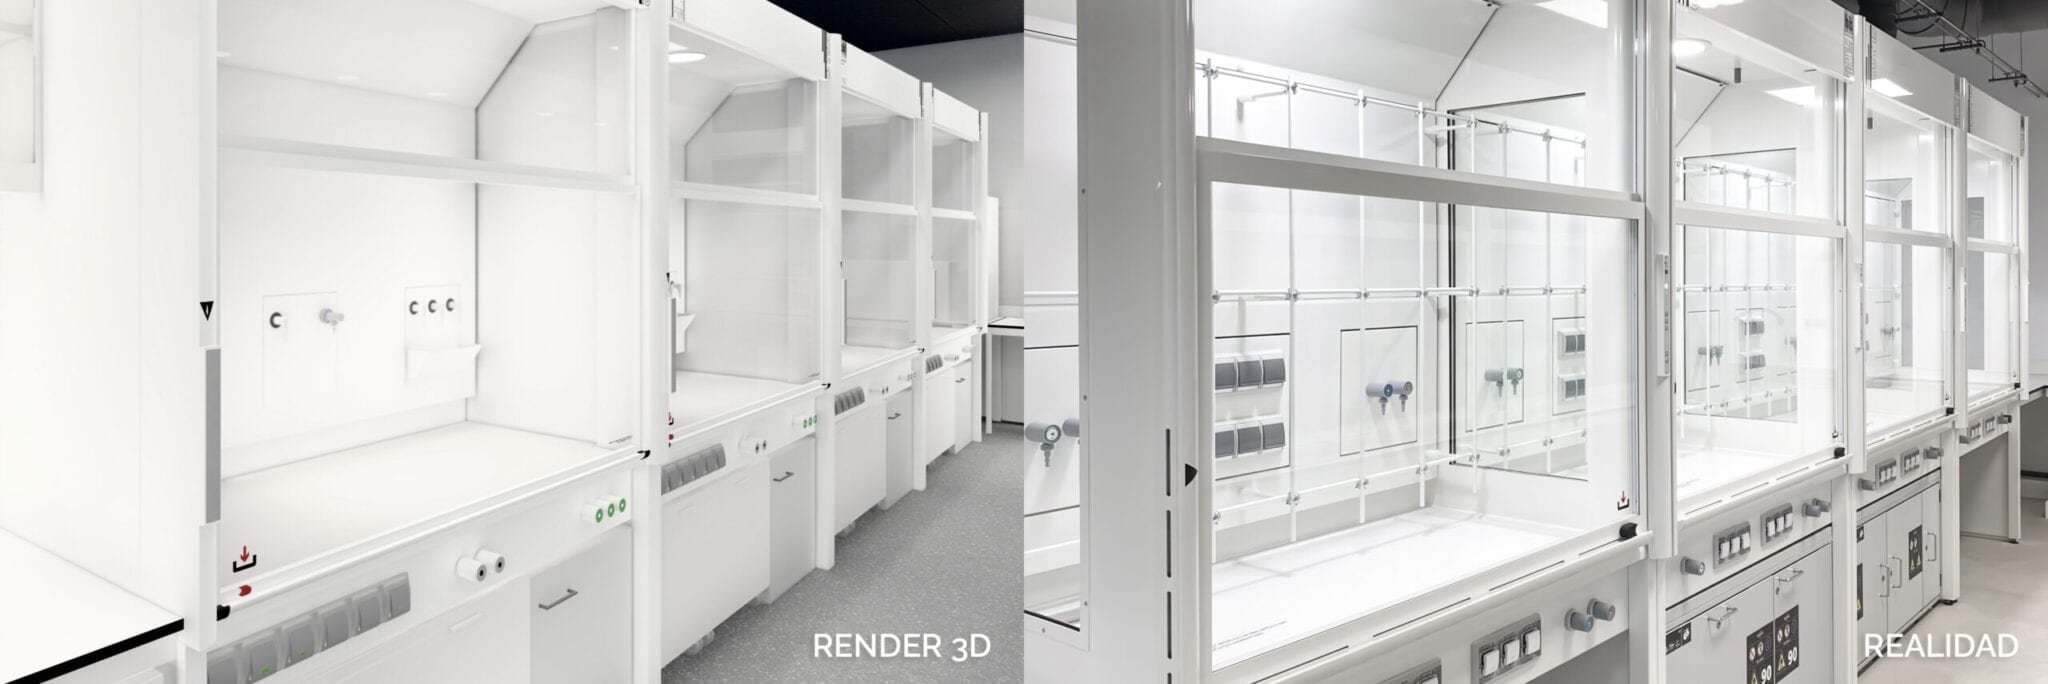 RENDER 3D VS REALIDAD